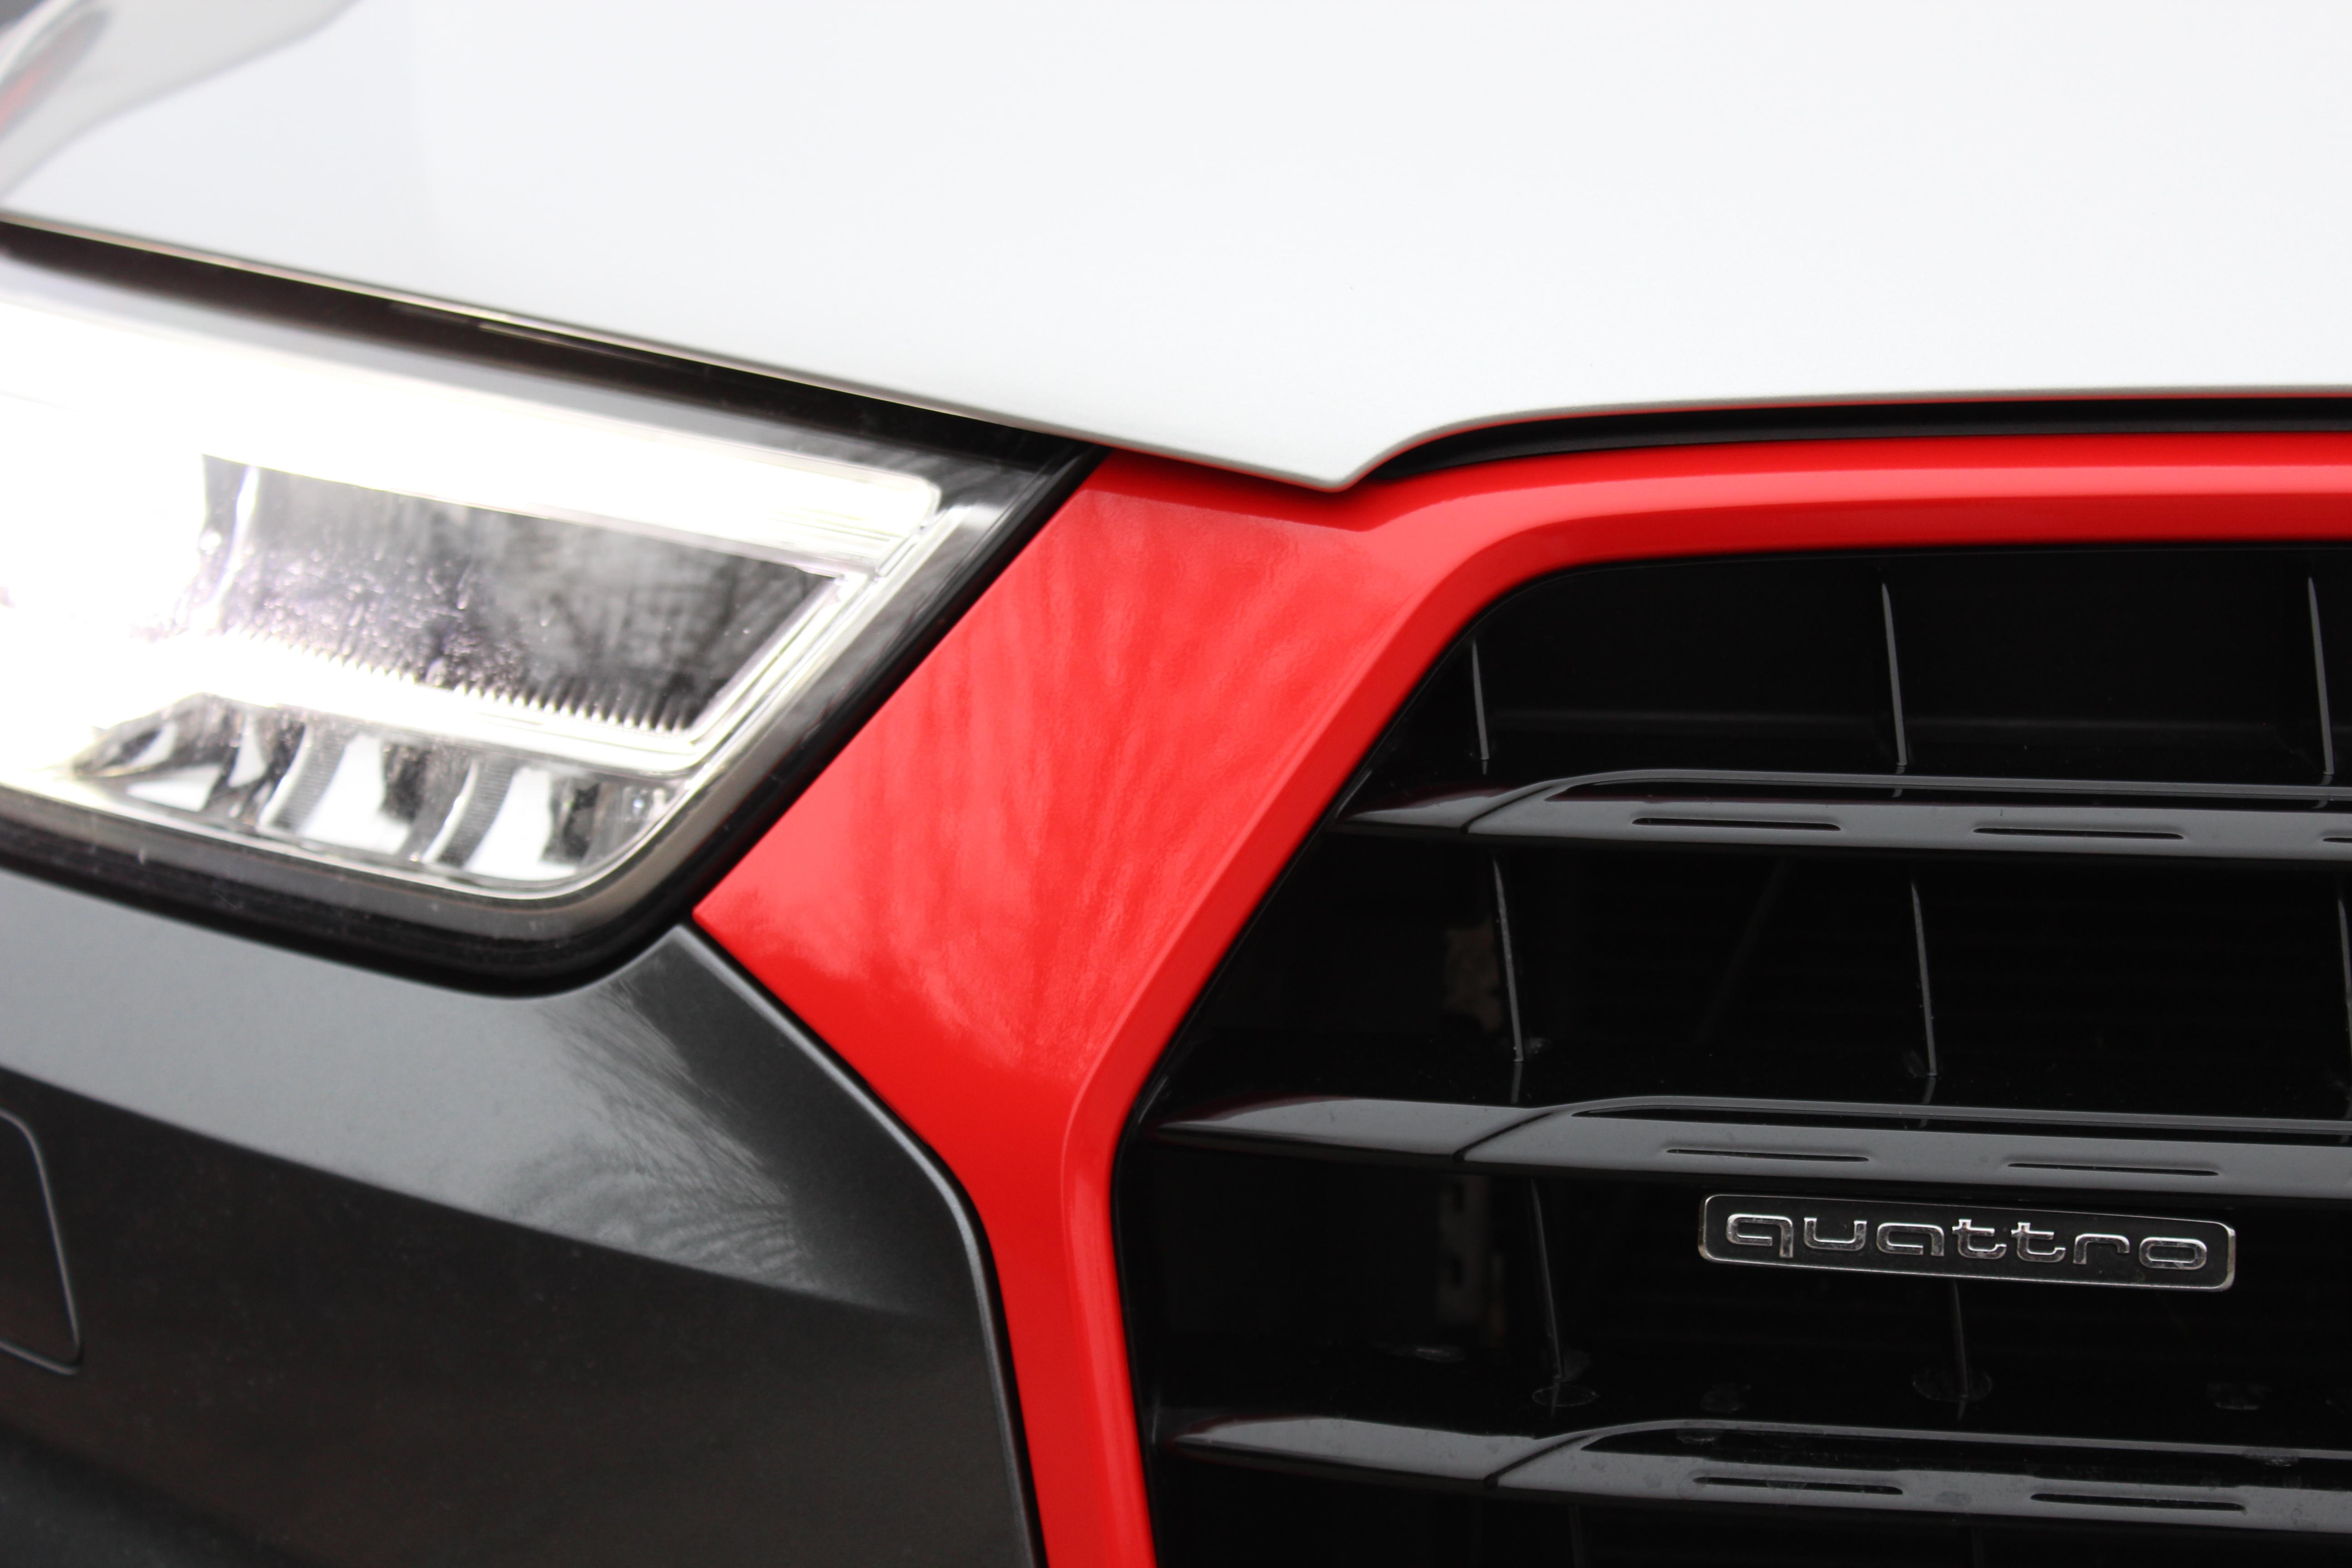 Audi_Q3_Streifen_Carwrap3